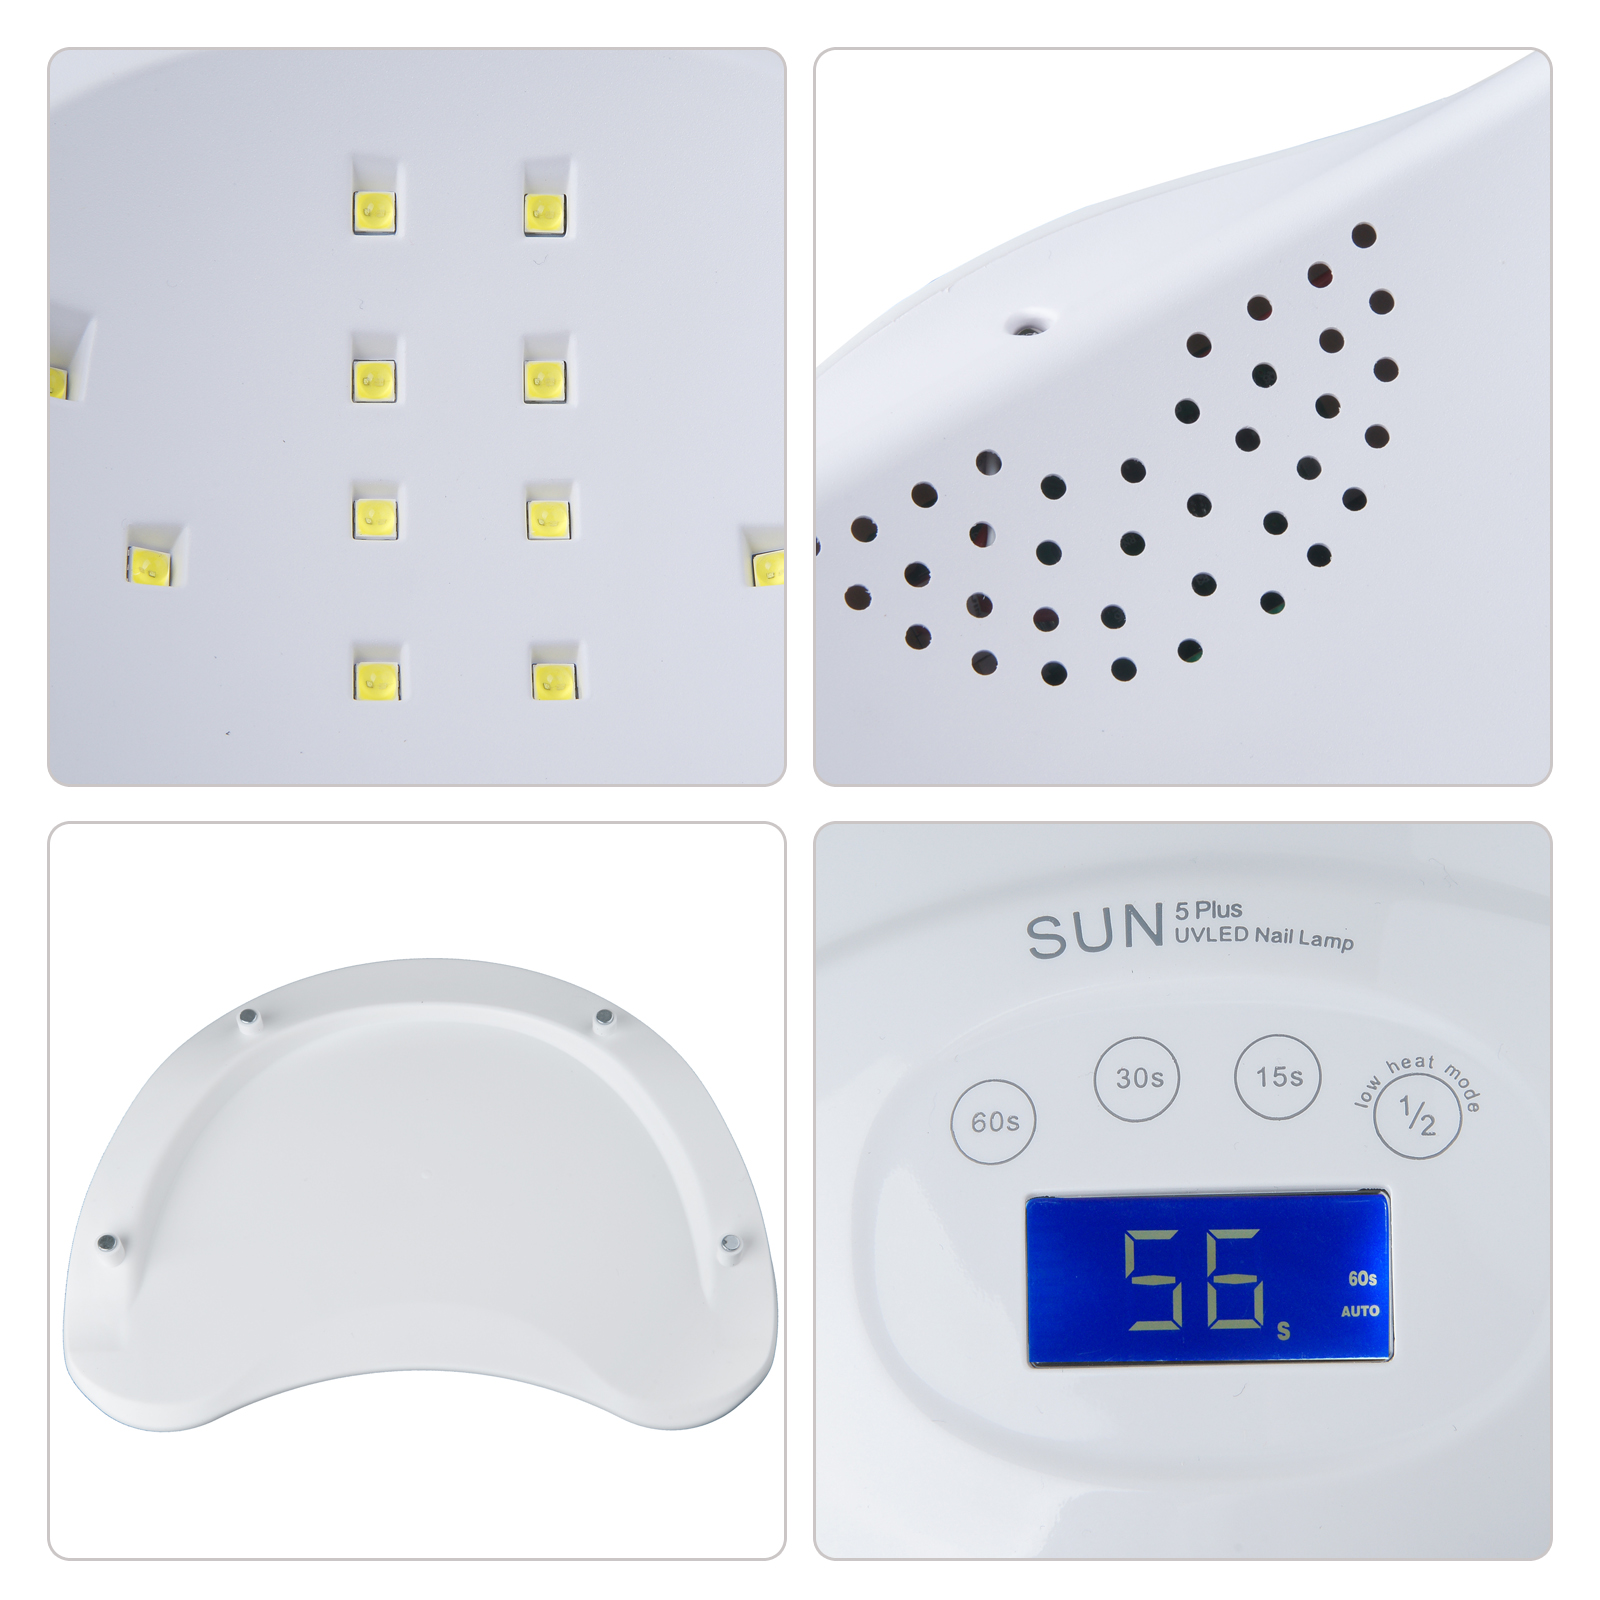 New 2 Hands Uv Nail Lamp 48w Led Light Dryer Art Curing